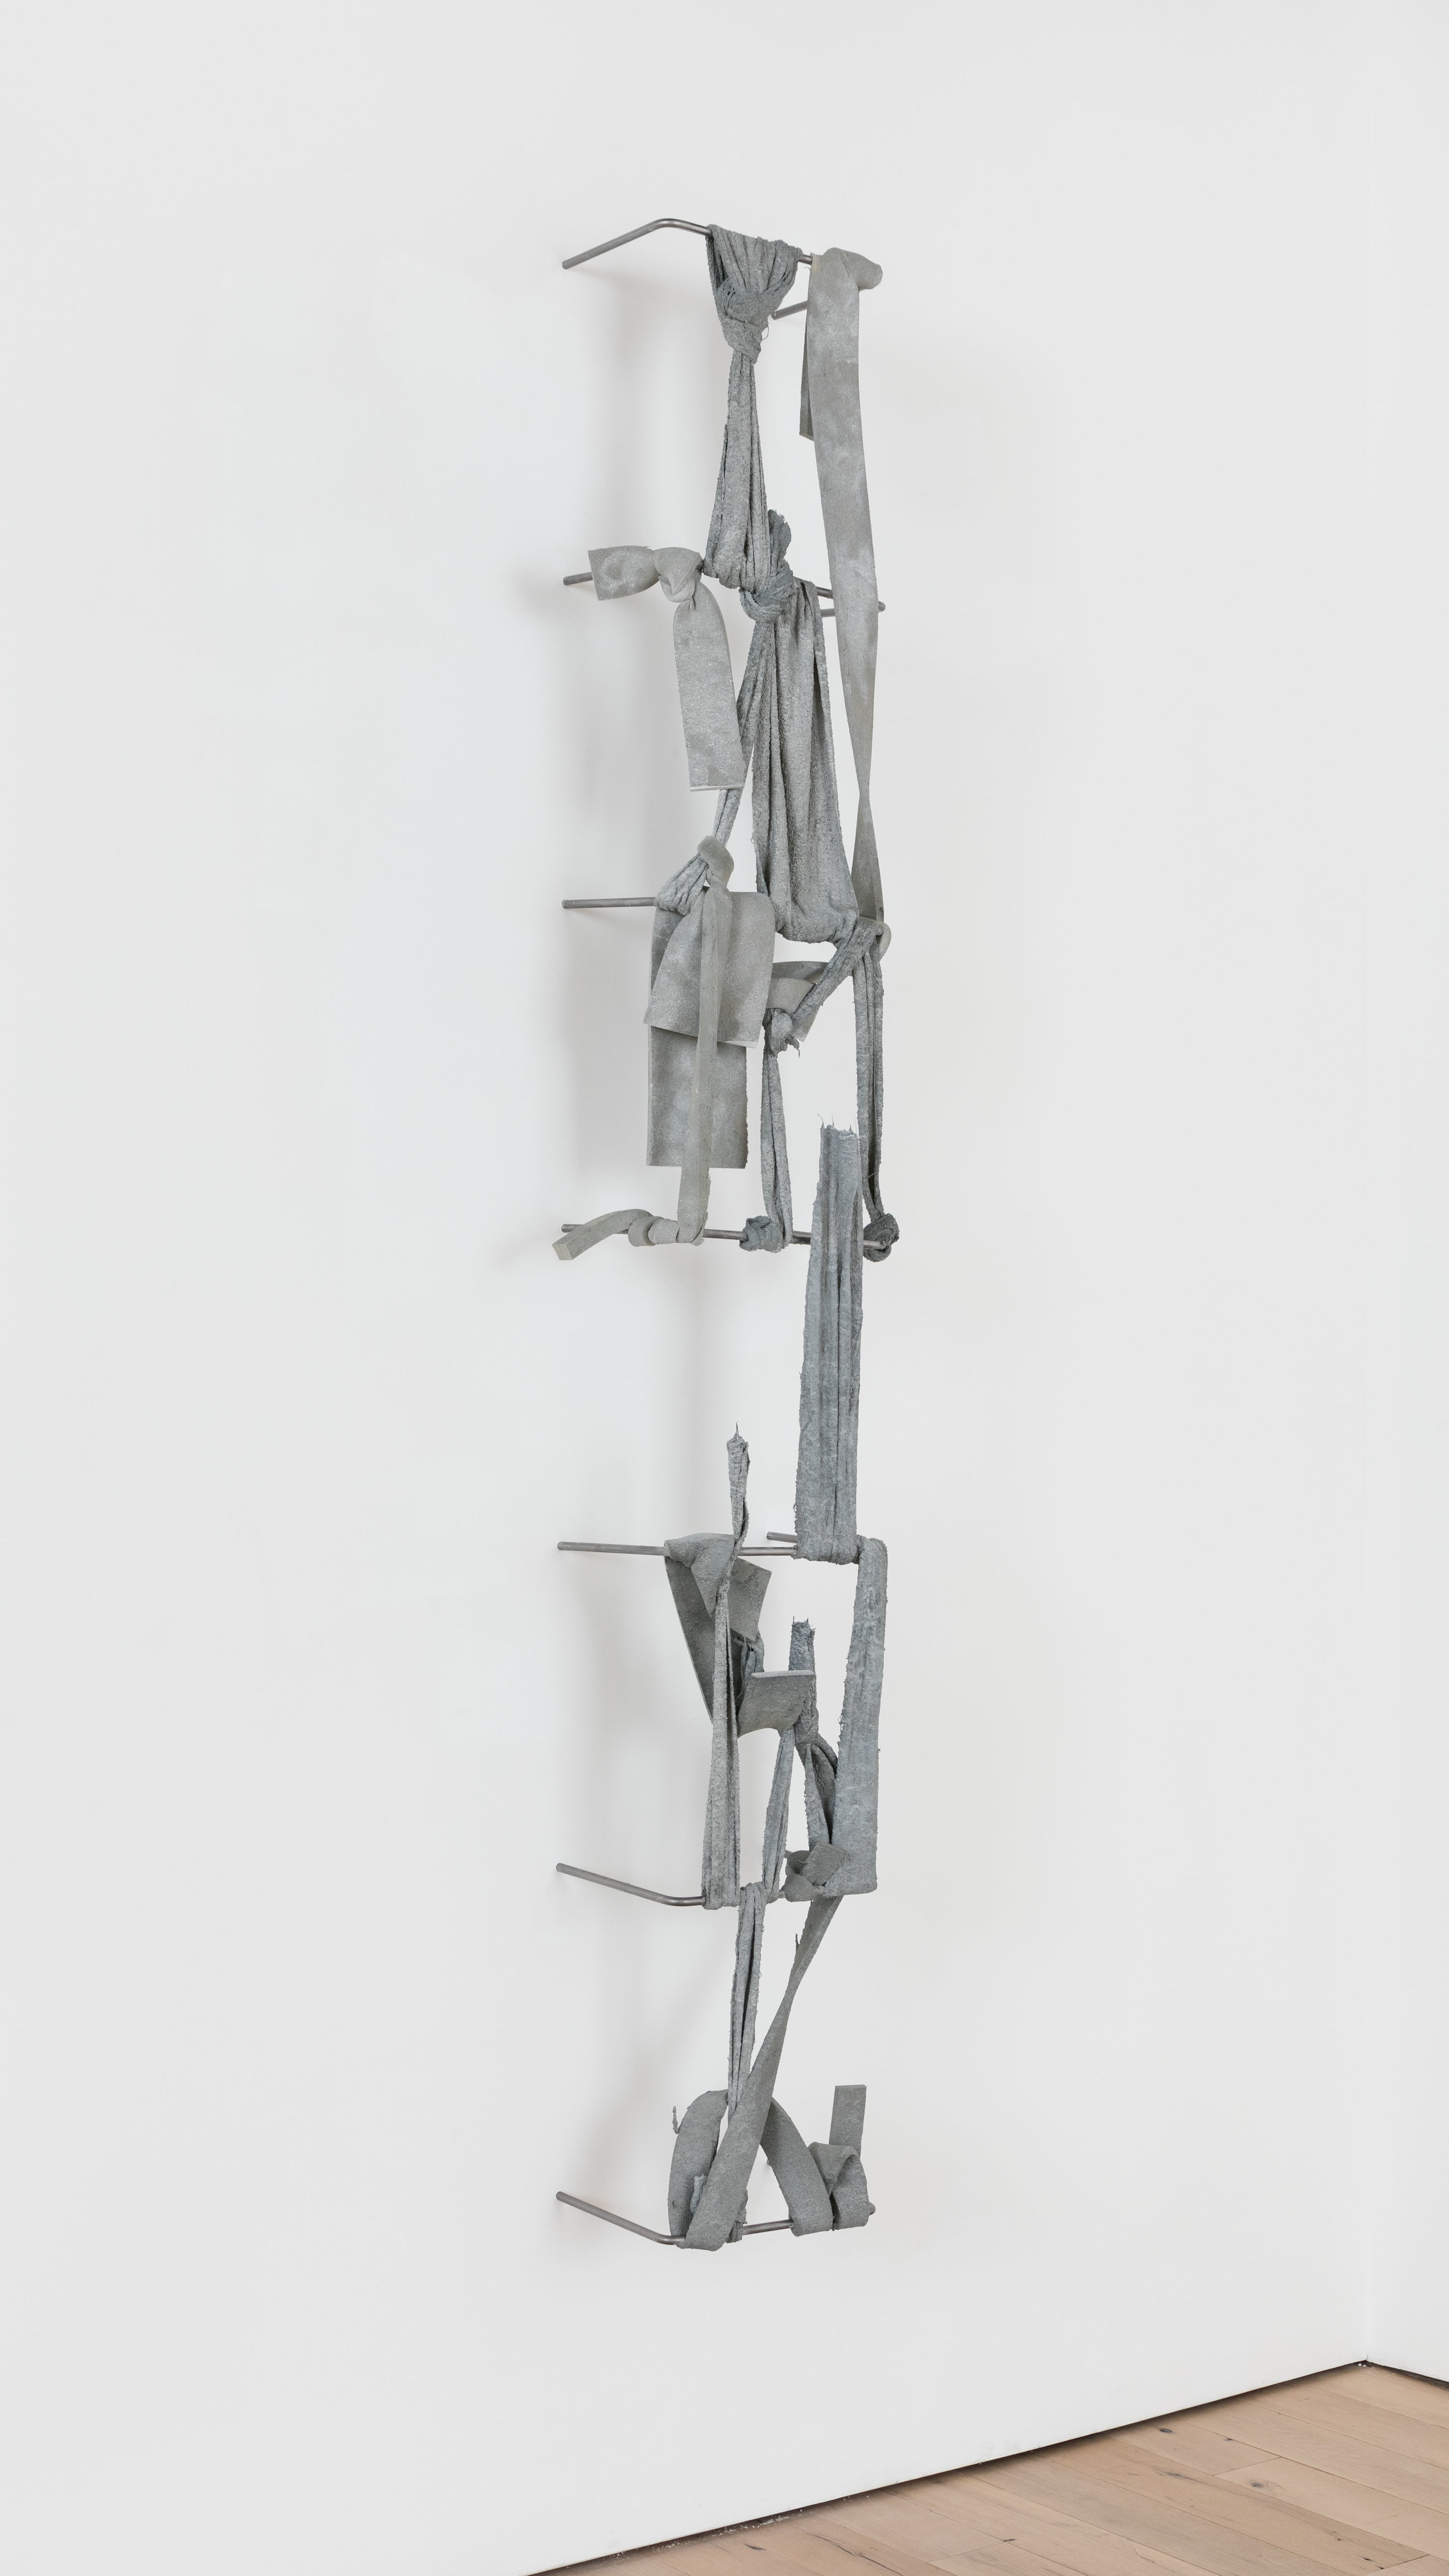 Nikita Gale,  FIXED LOOP I-II , 2018, concrete, polyurethane foam, terrycloth, steel, 115 × 21 3/4 × 13 1/4 in.